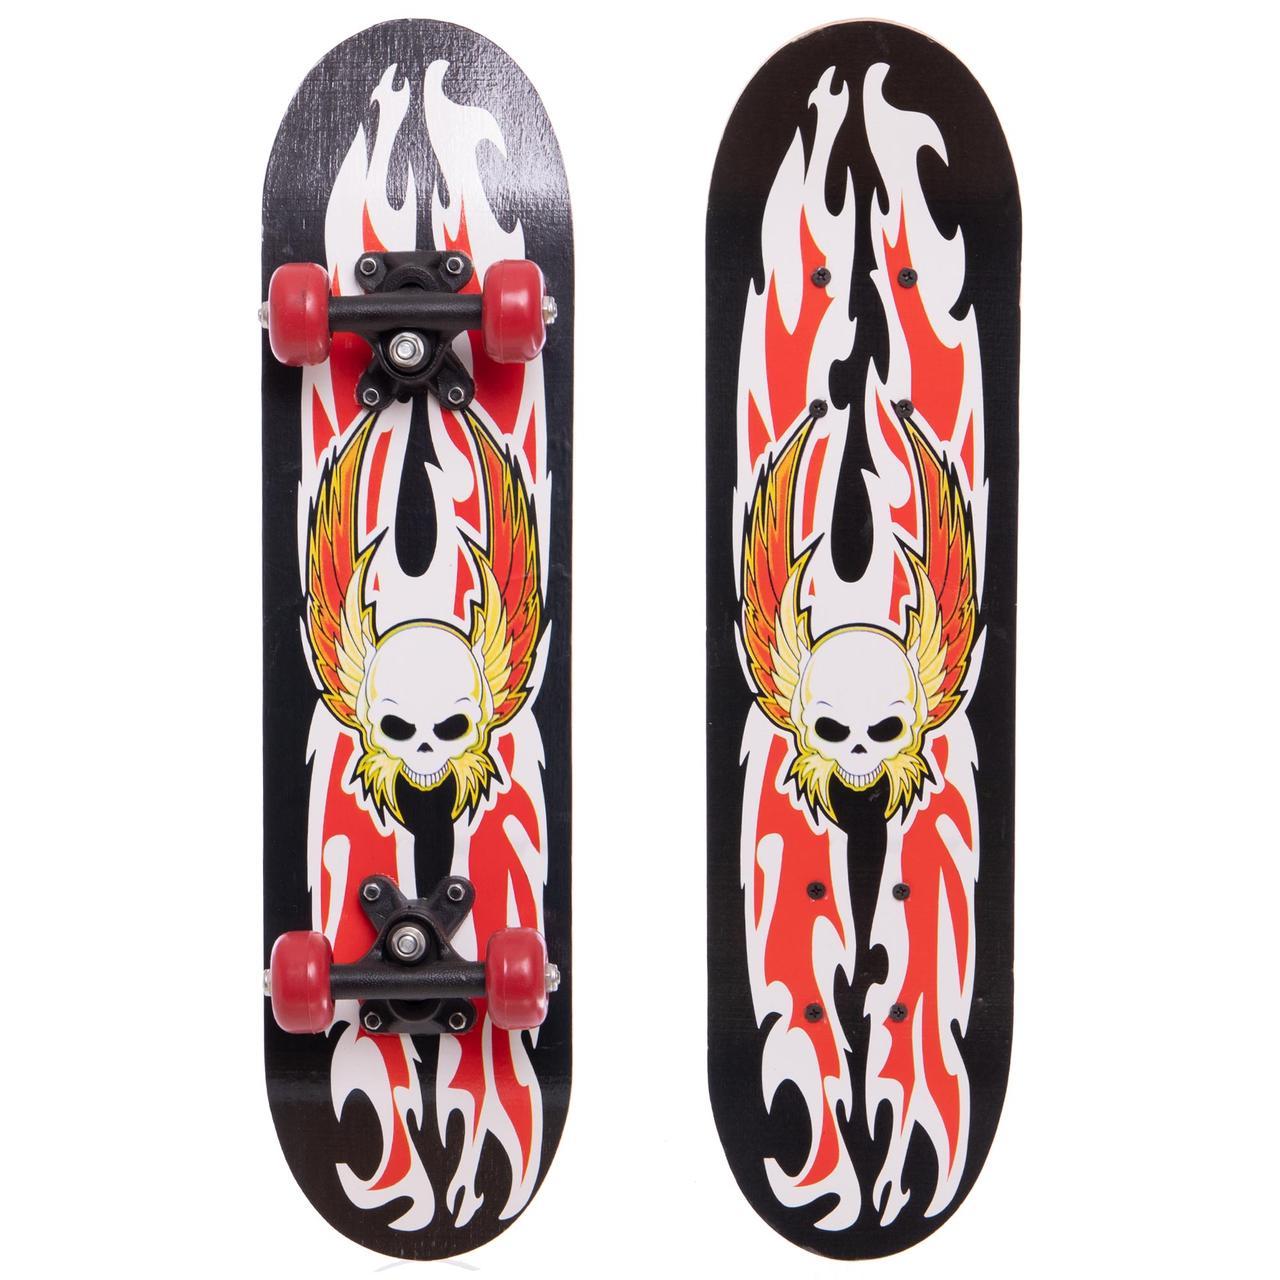 Скейтборд Mini в сборе (роликовая доска) 60х15х1,2см SK-4932, Черно-красный